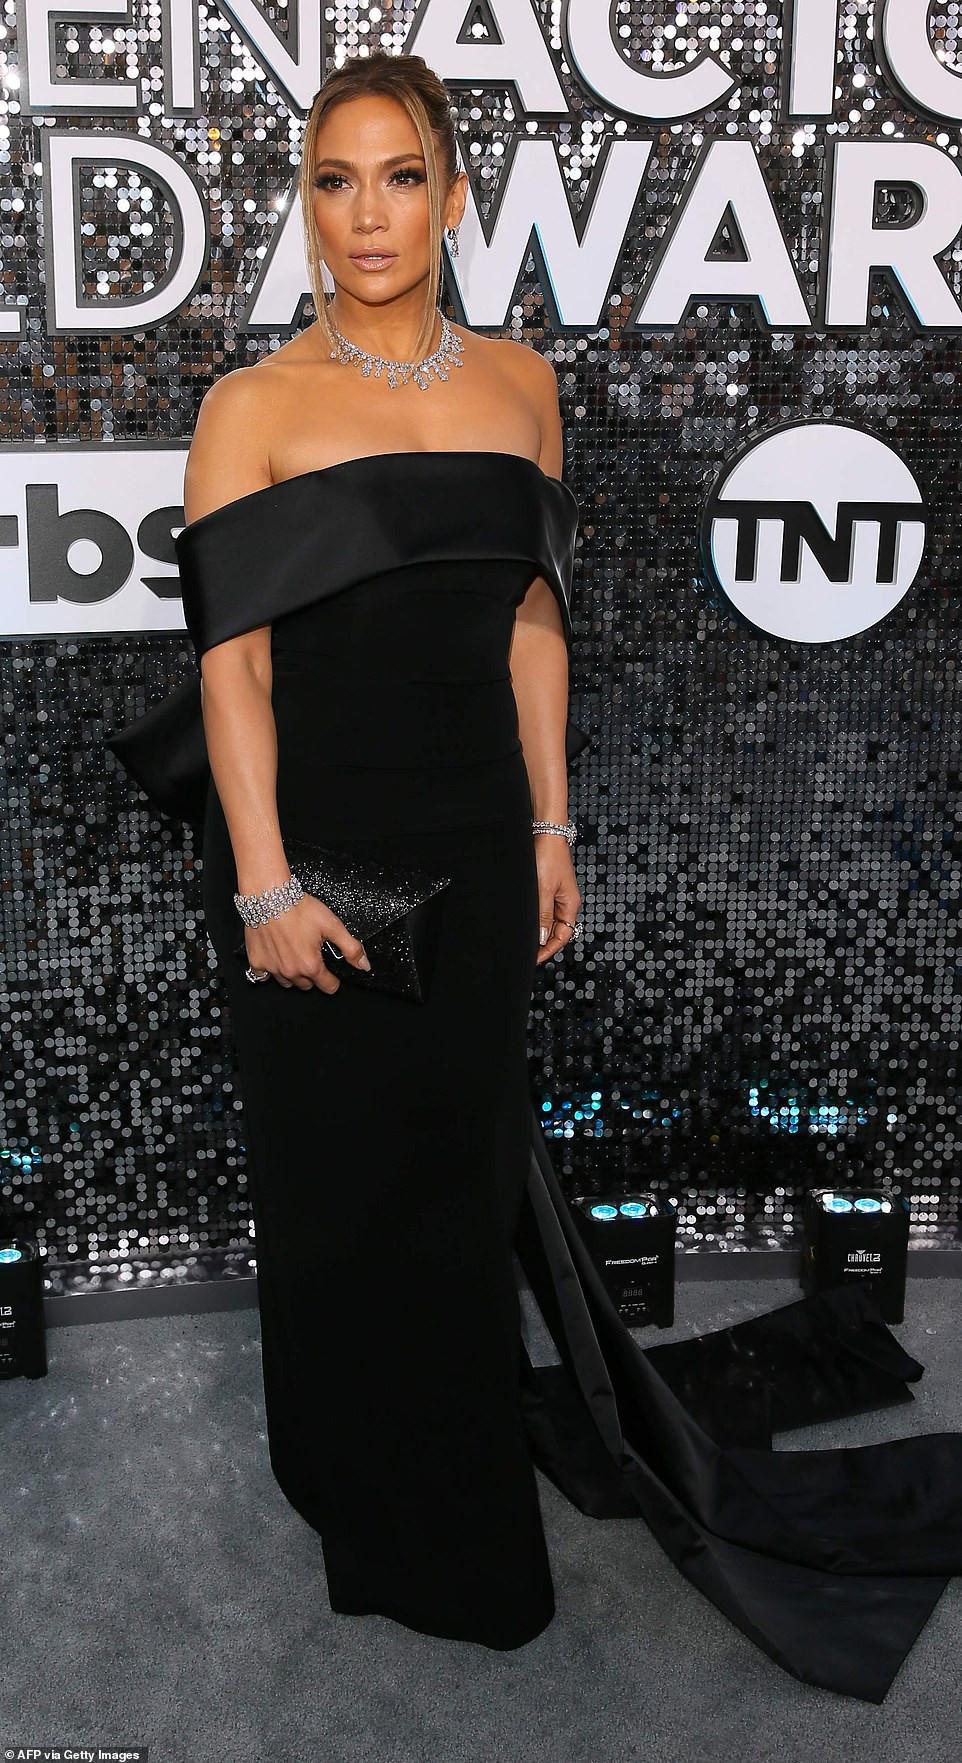 Jennifer Lopez dazzles in $9M worth of diamonds at SAG Awards (Photos)